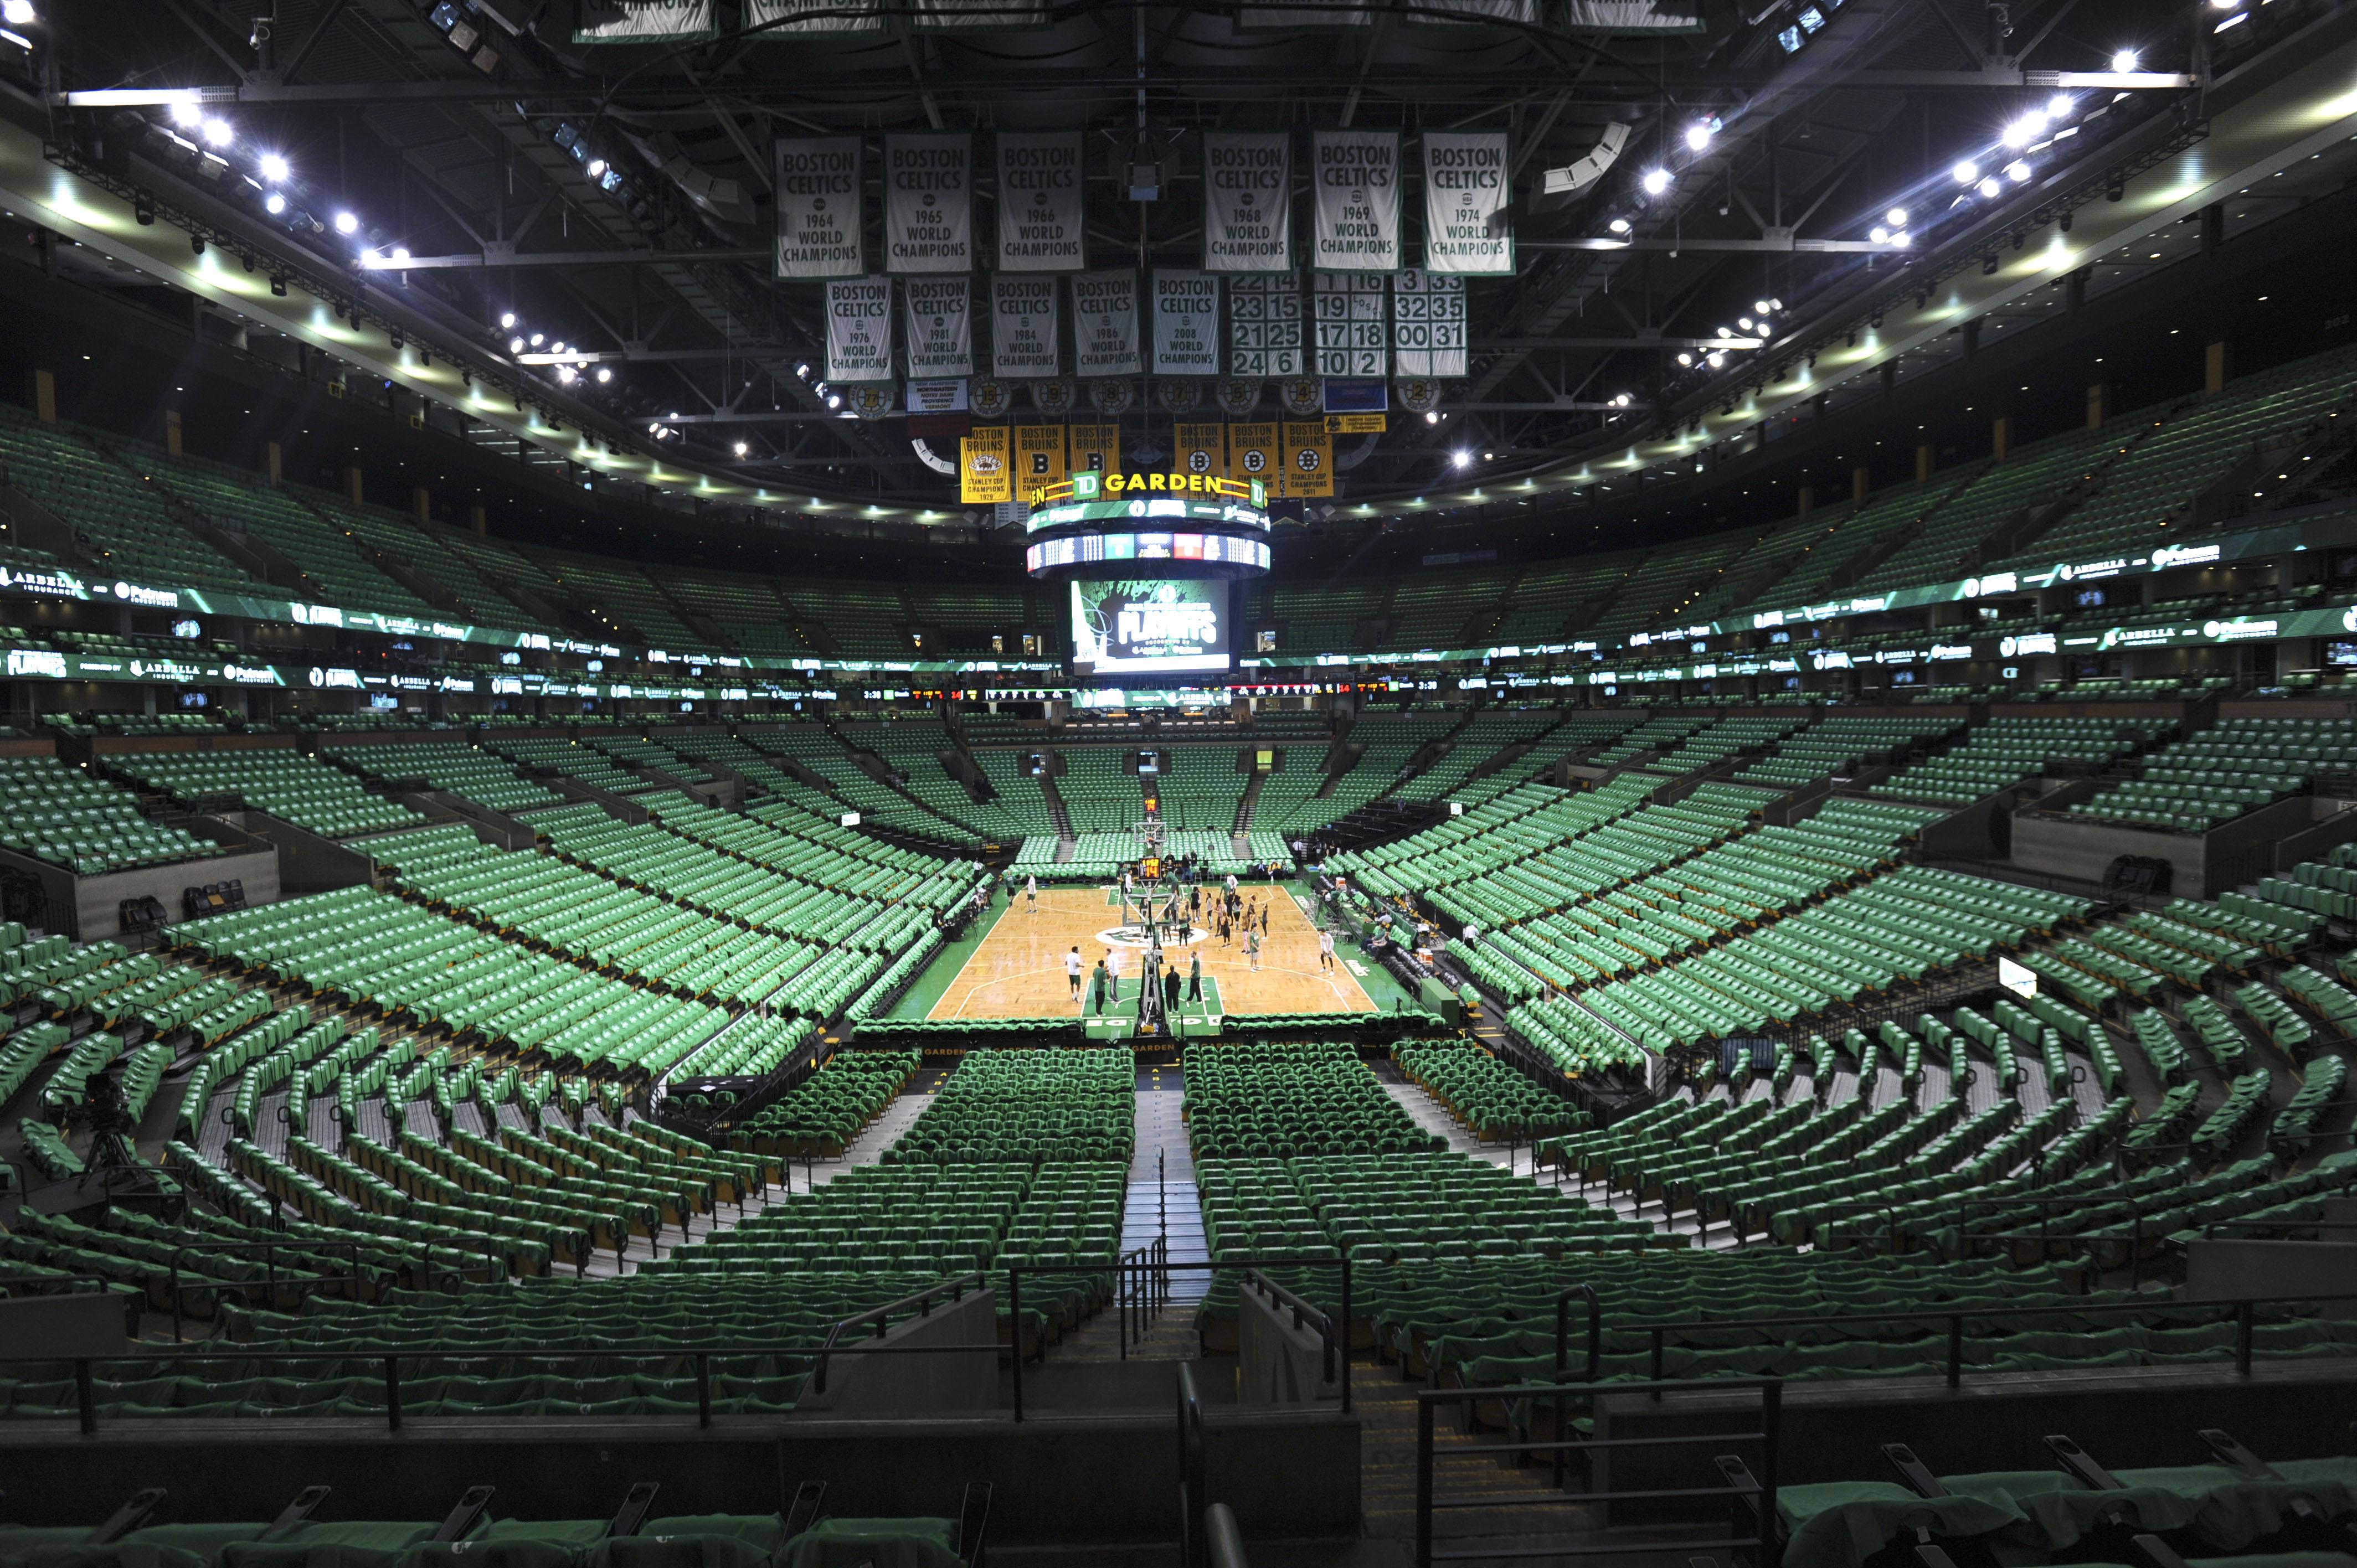 Atlanta Hawks Iphone 6 Wallpaper Boston Celtics Trade Rumors The 5 Superstars Linked To